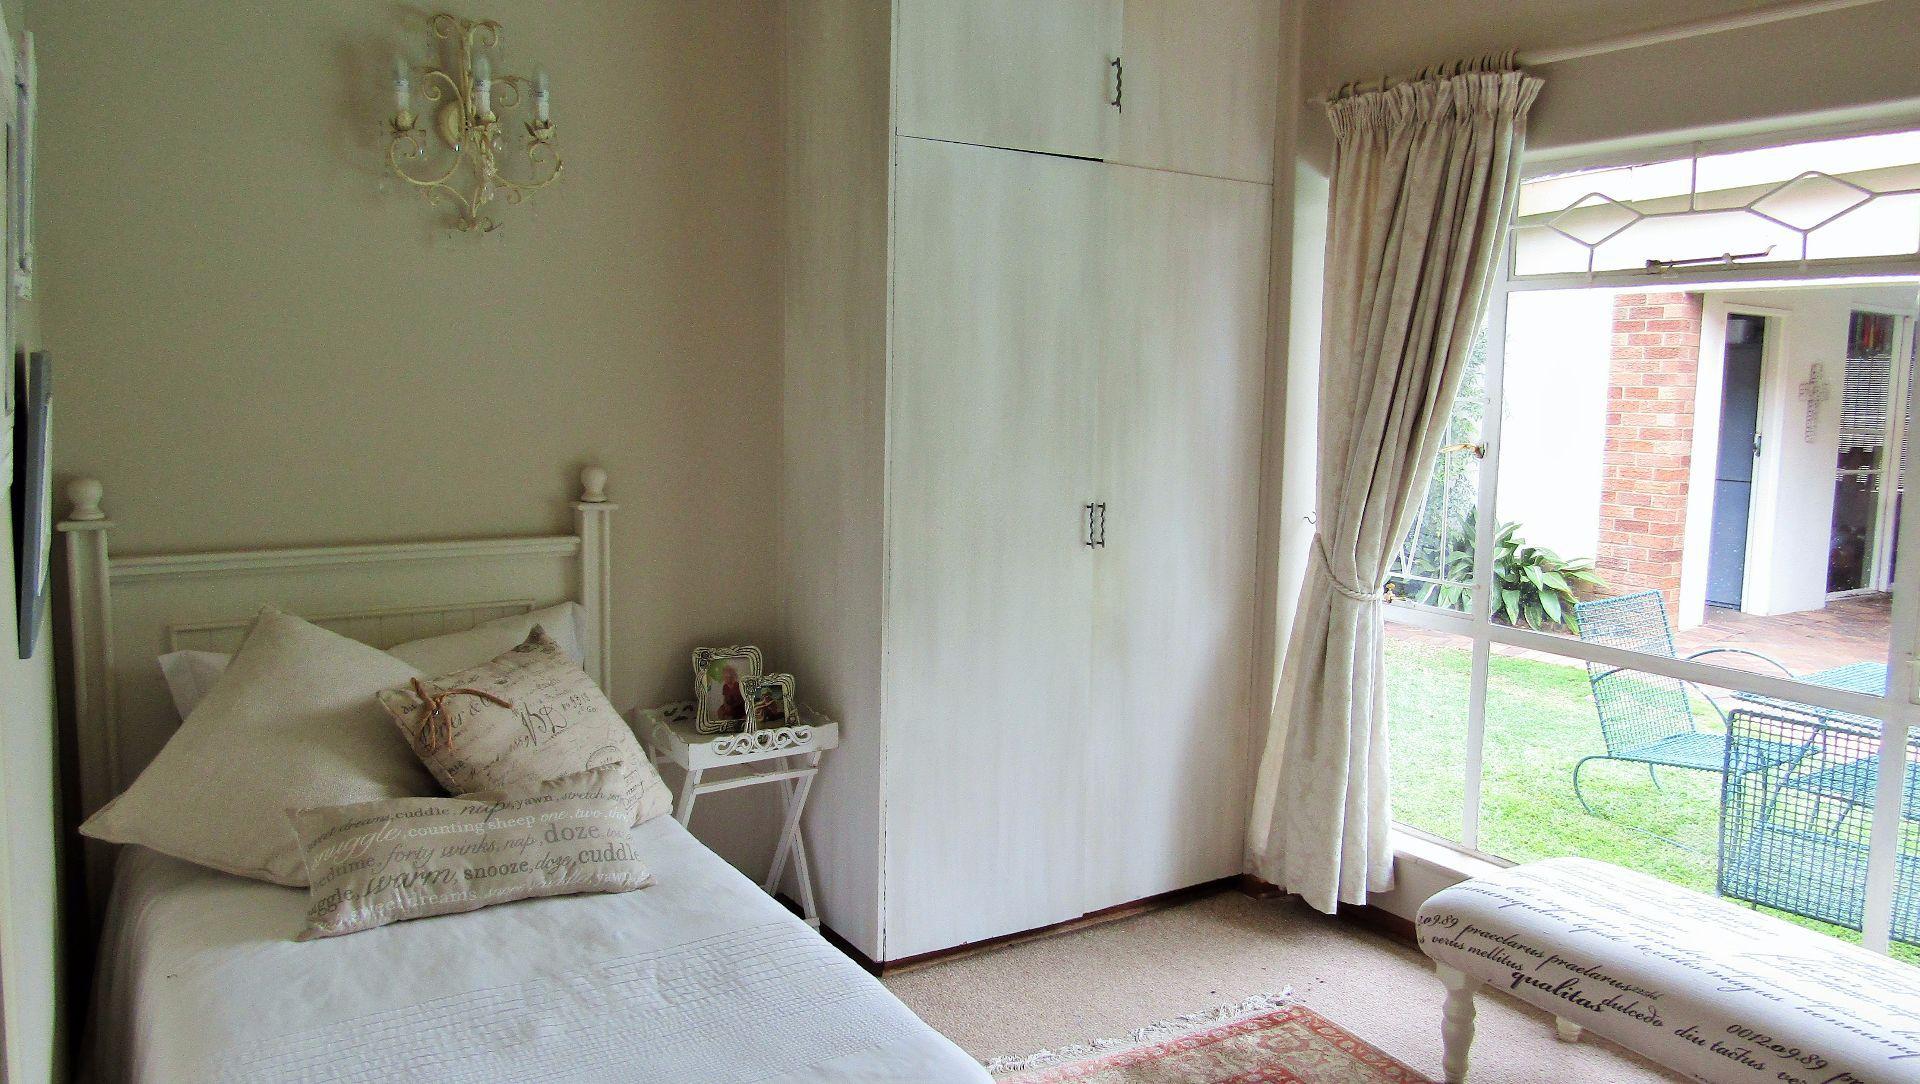 Heilige Akker property for sale. Ref No: 13540532. Picture no 18